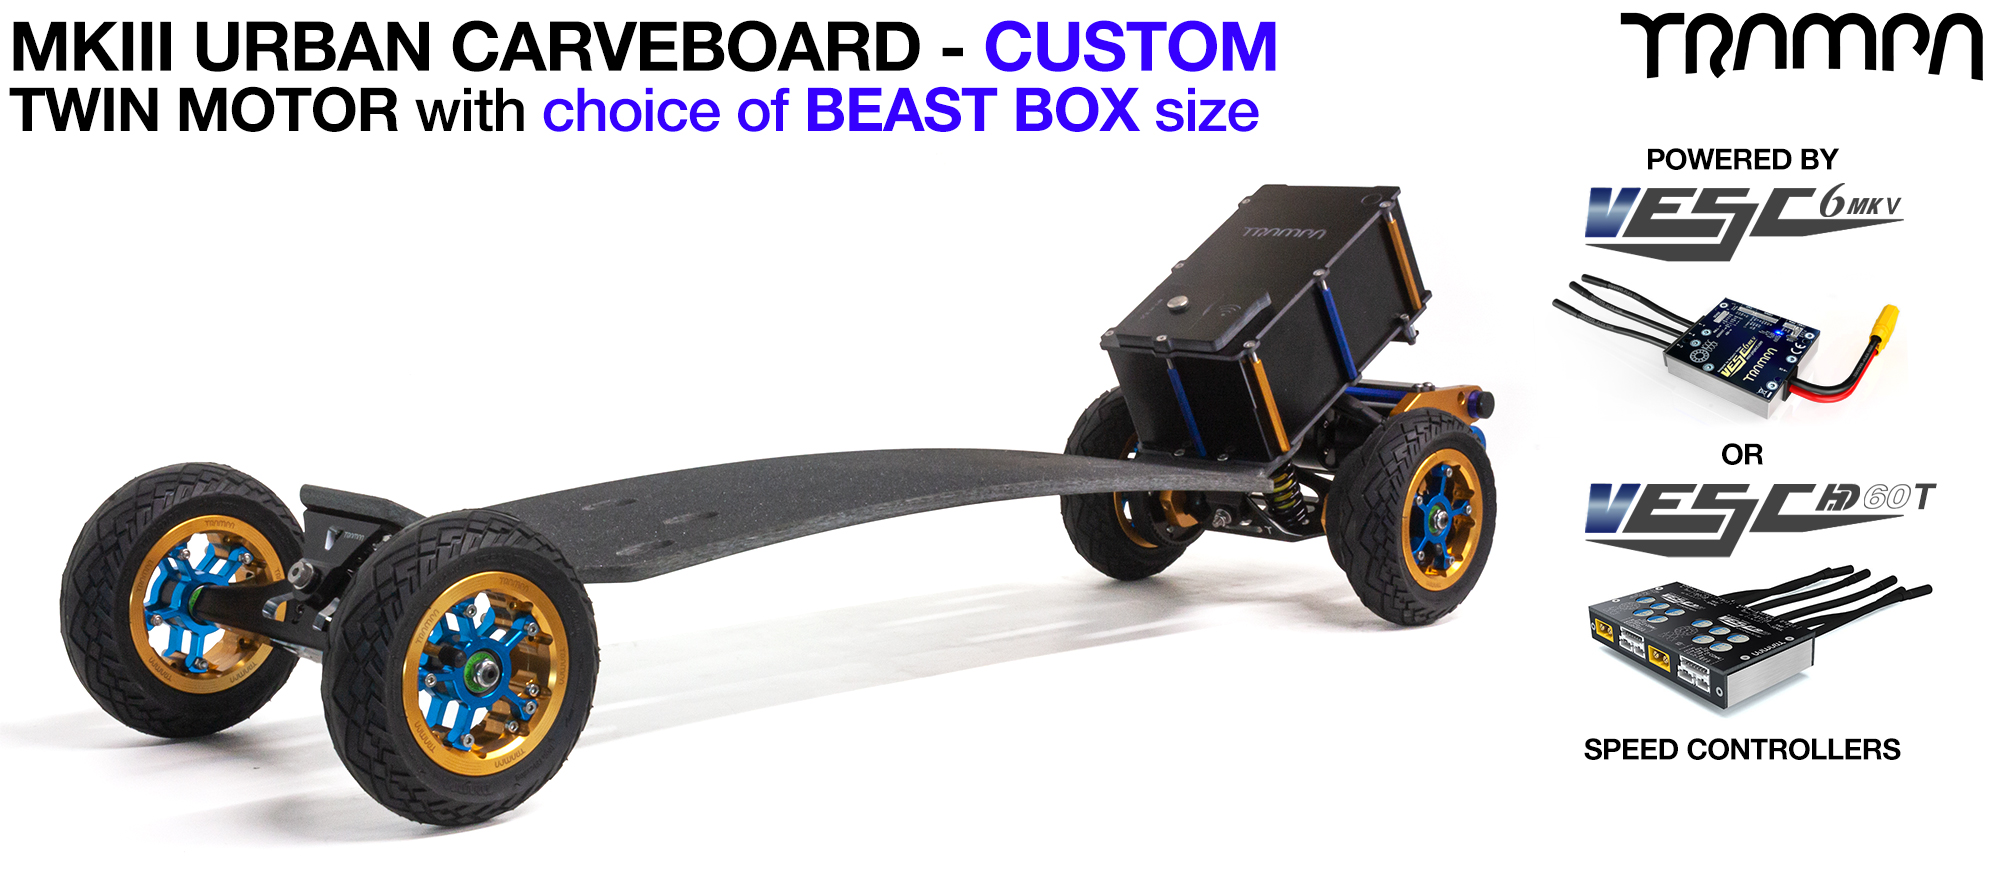 TRAMPA's MkIII Electric URBAN Carveboard - uses Mini Spring Trucks with MkIII Carve board Motor Mount,s Custom TRAMPA hubs & 125mm URBAN longboard Tyres - TWIN Motor CUSTOM